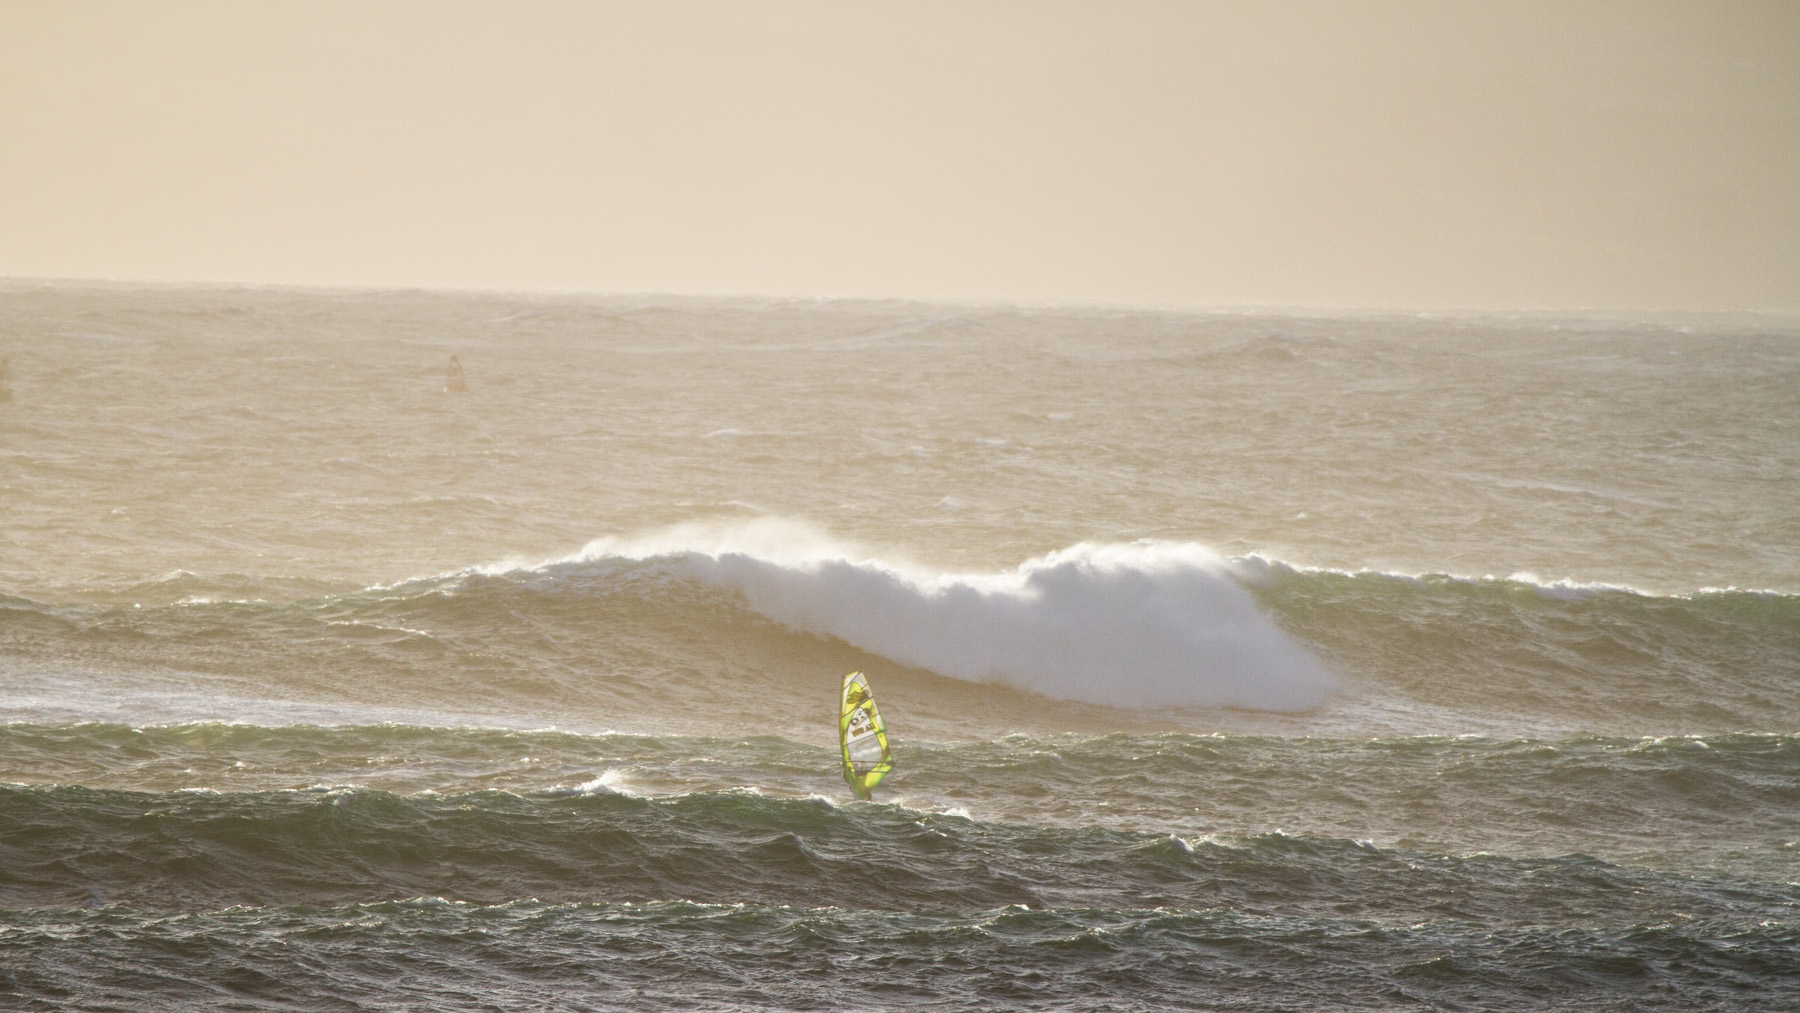 alastair mcleod windsurfing right point at cat bay on phillip island